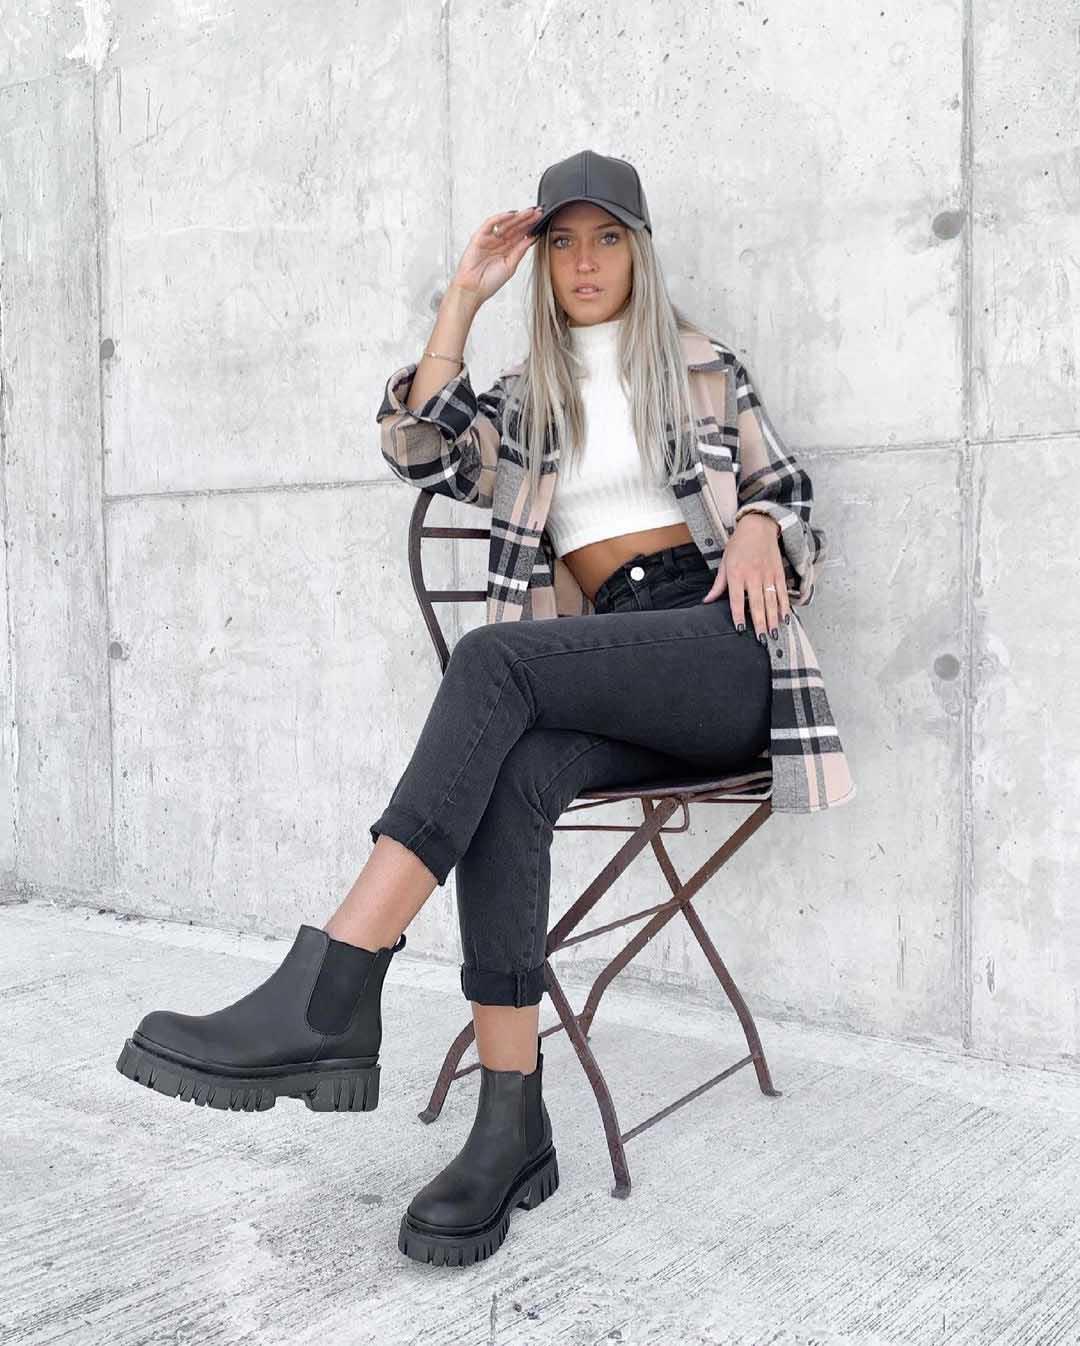 pantalones chupines invierno 2021 moda mujer 2021